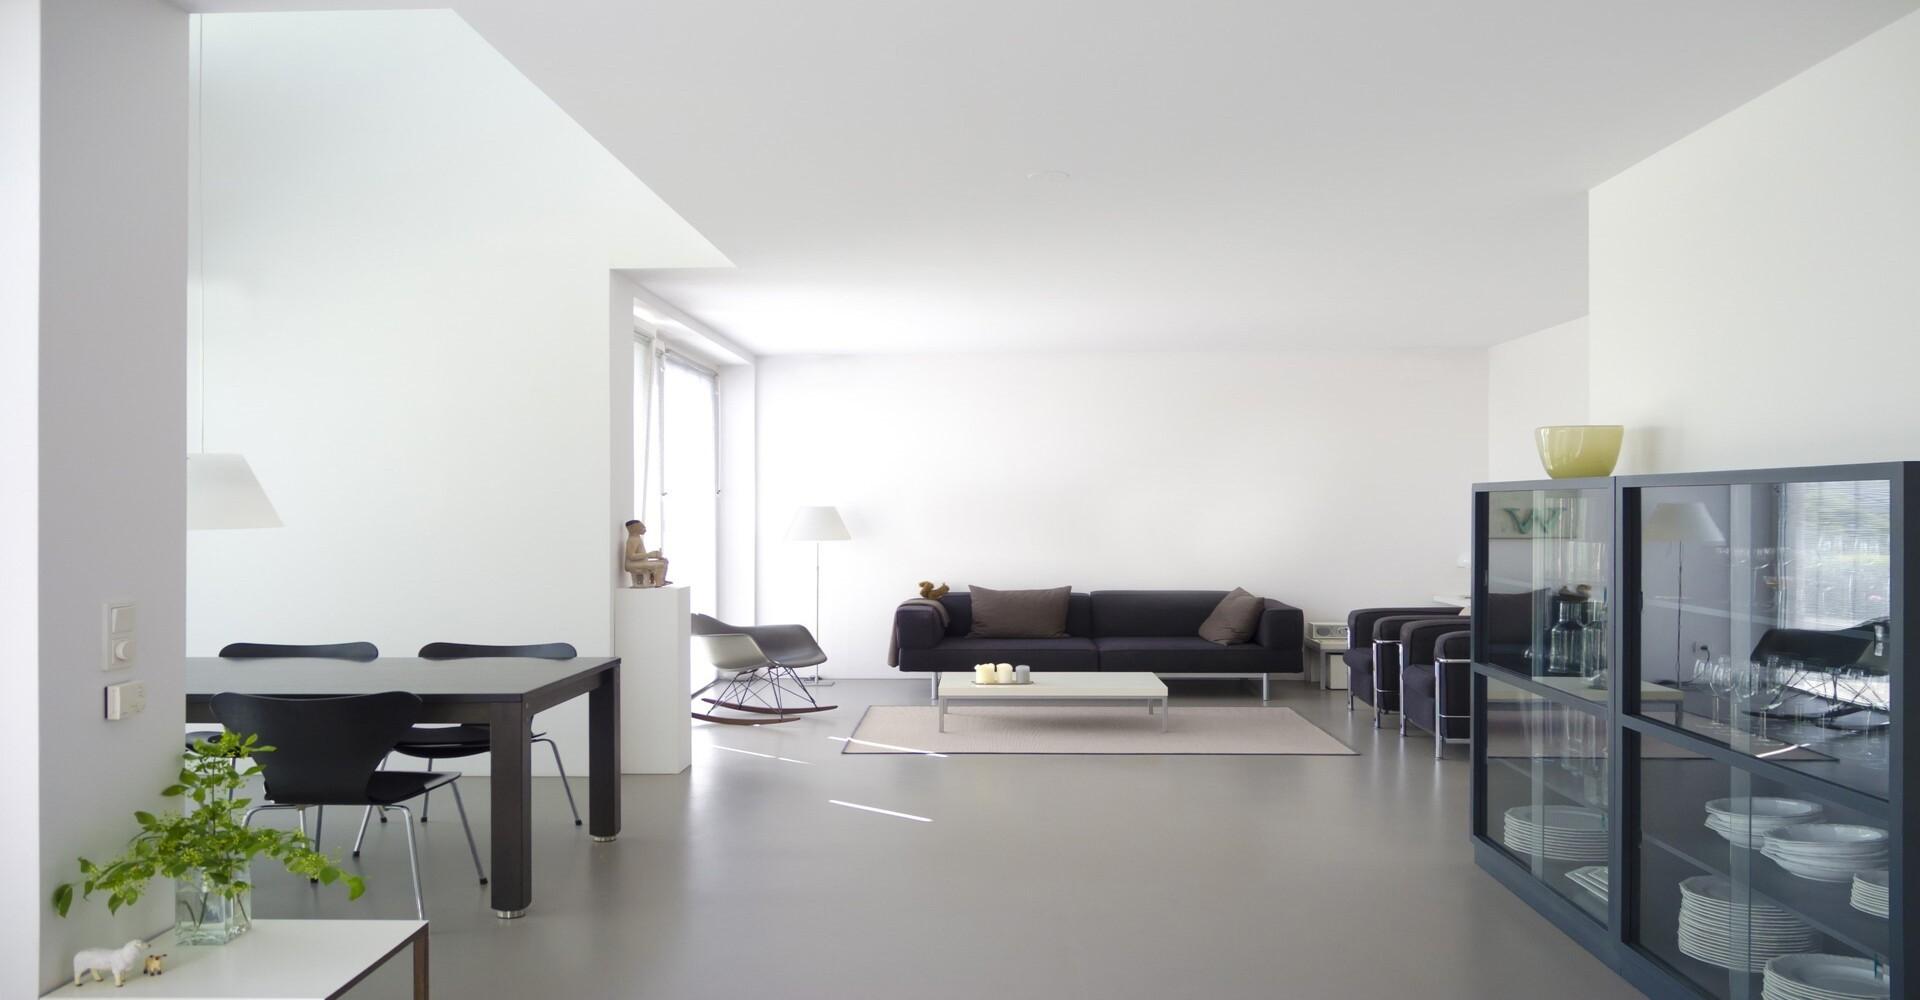 Gietvloer over plavuizen vloer met vloerverwarming